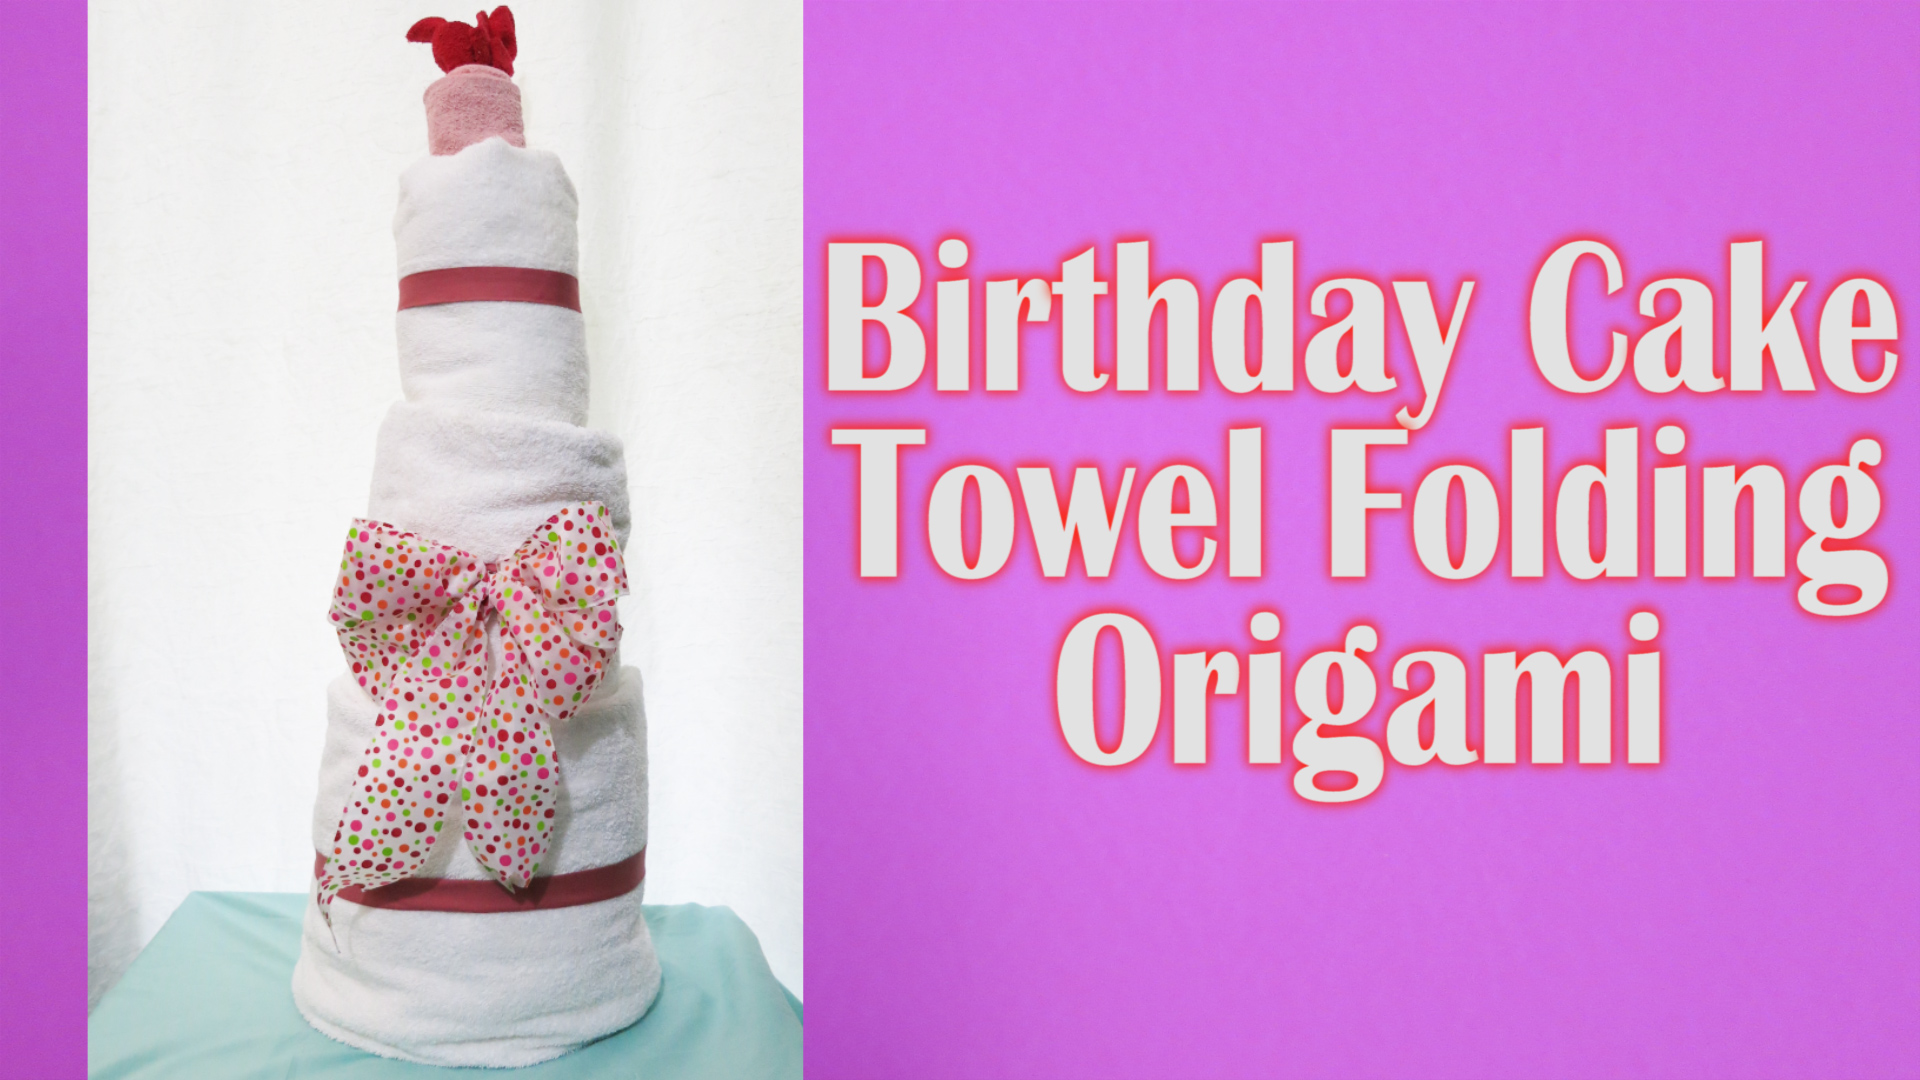 Happy Birthday Cake Towel Folding Origami.jpg